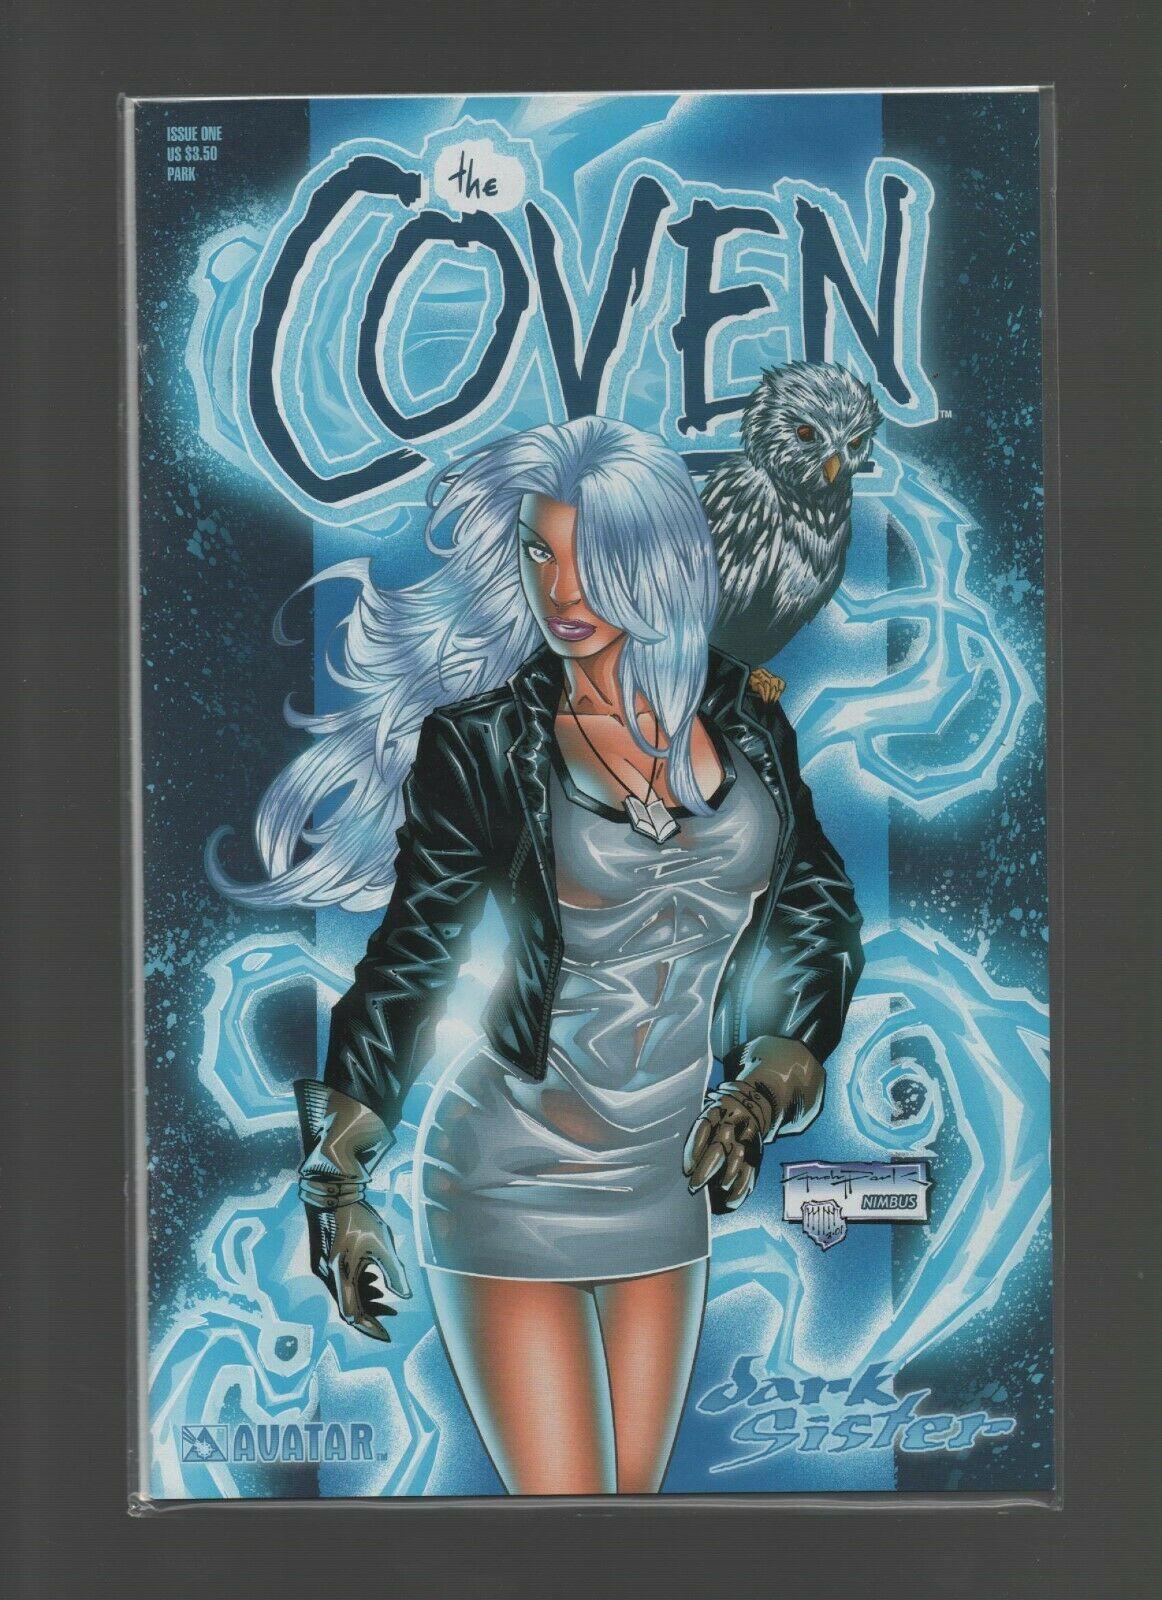 The Coven #1 - Avatar Comics - Dark Sister - Nimbus - We Combine Shipping.